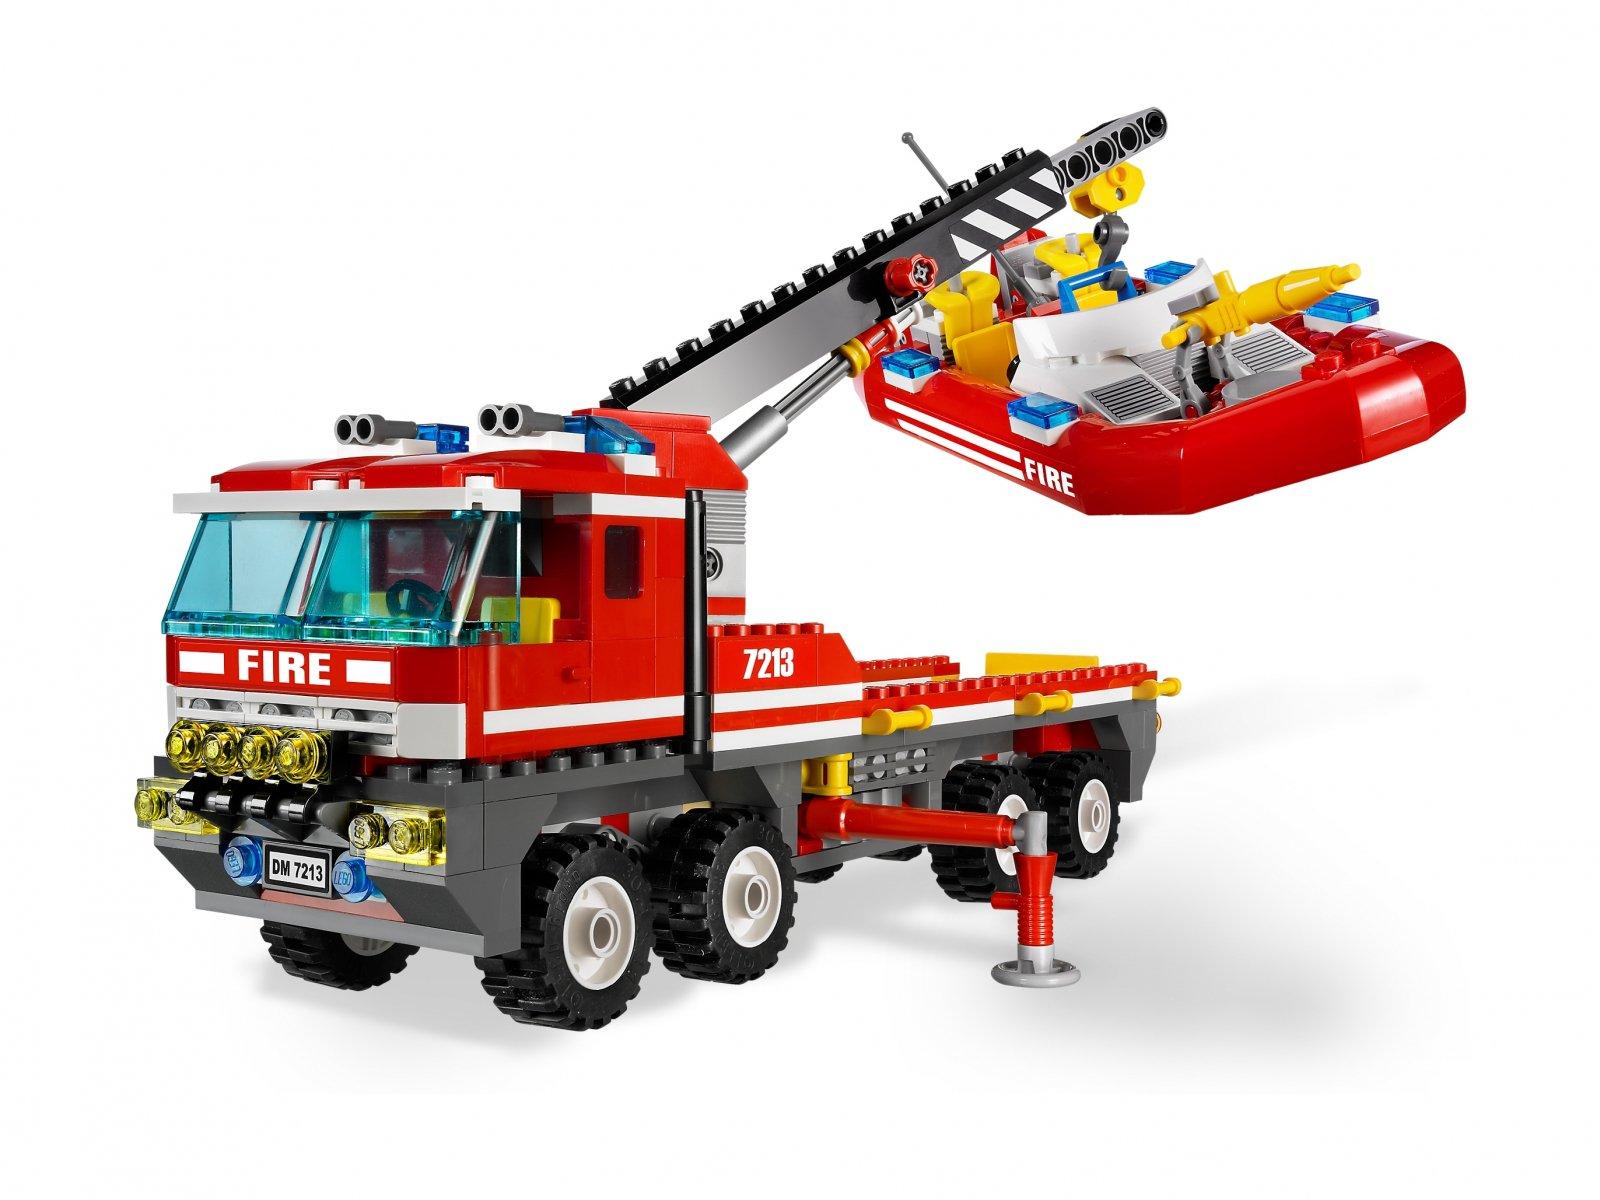 LEGO 7213 Off-Road Fire Truck & Fireboat